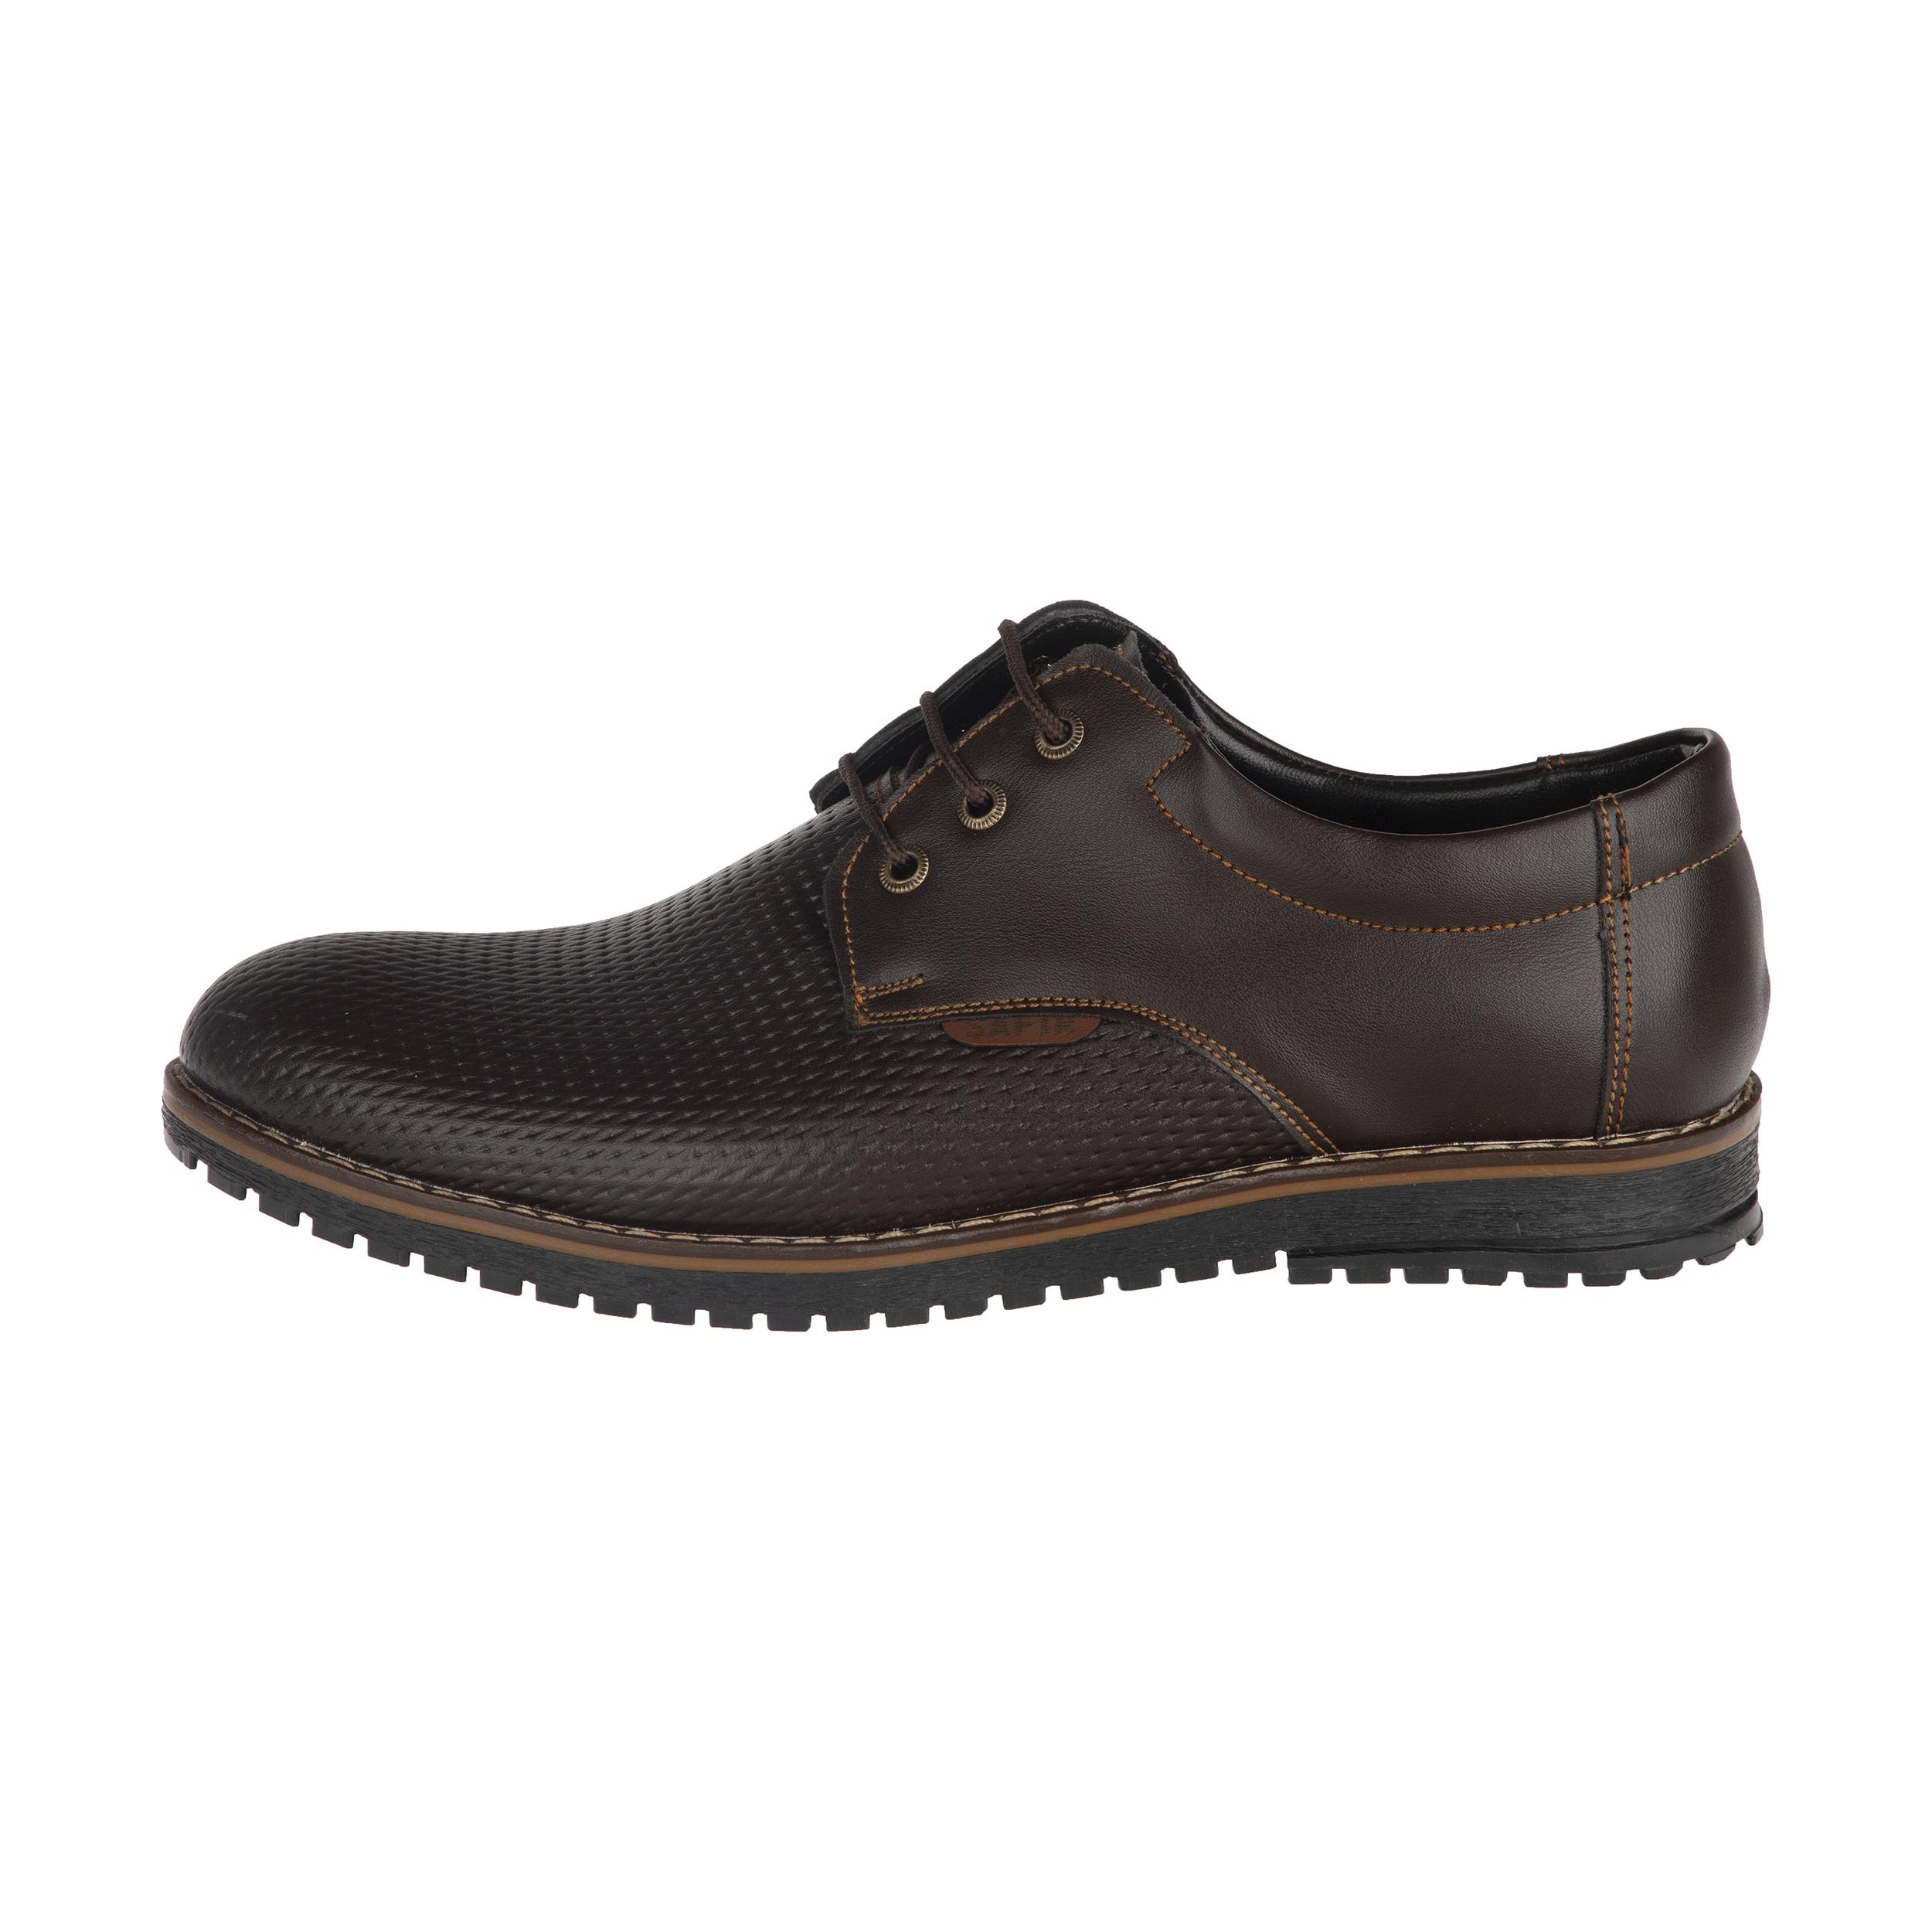 کفش روزمره مردانه مدل k.baz.101